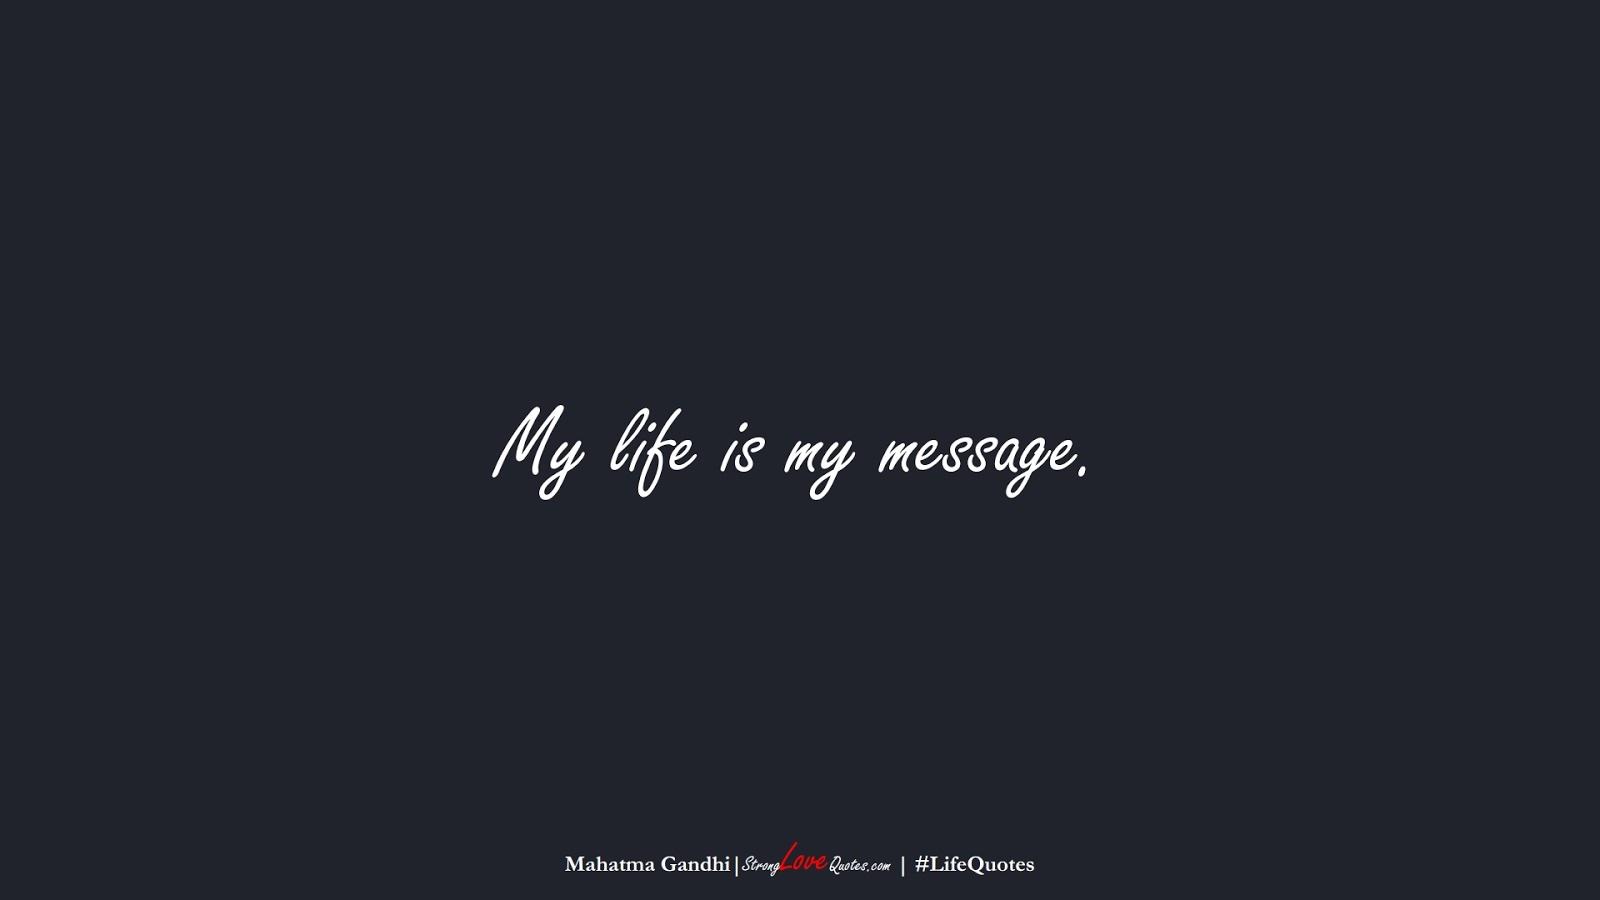 My life is my message. (Mahatma Gandhi);  #LifeQuotes